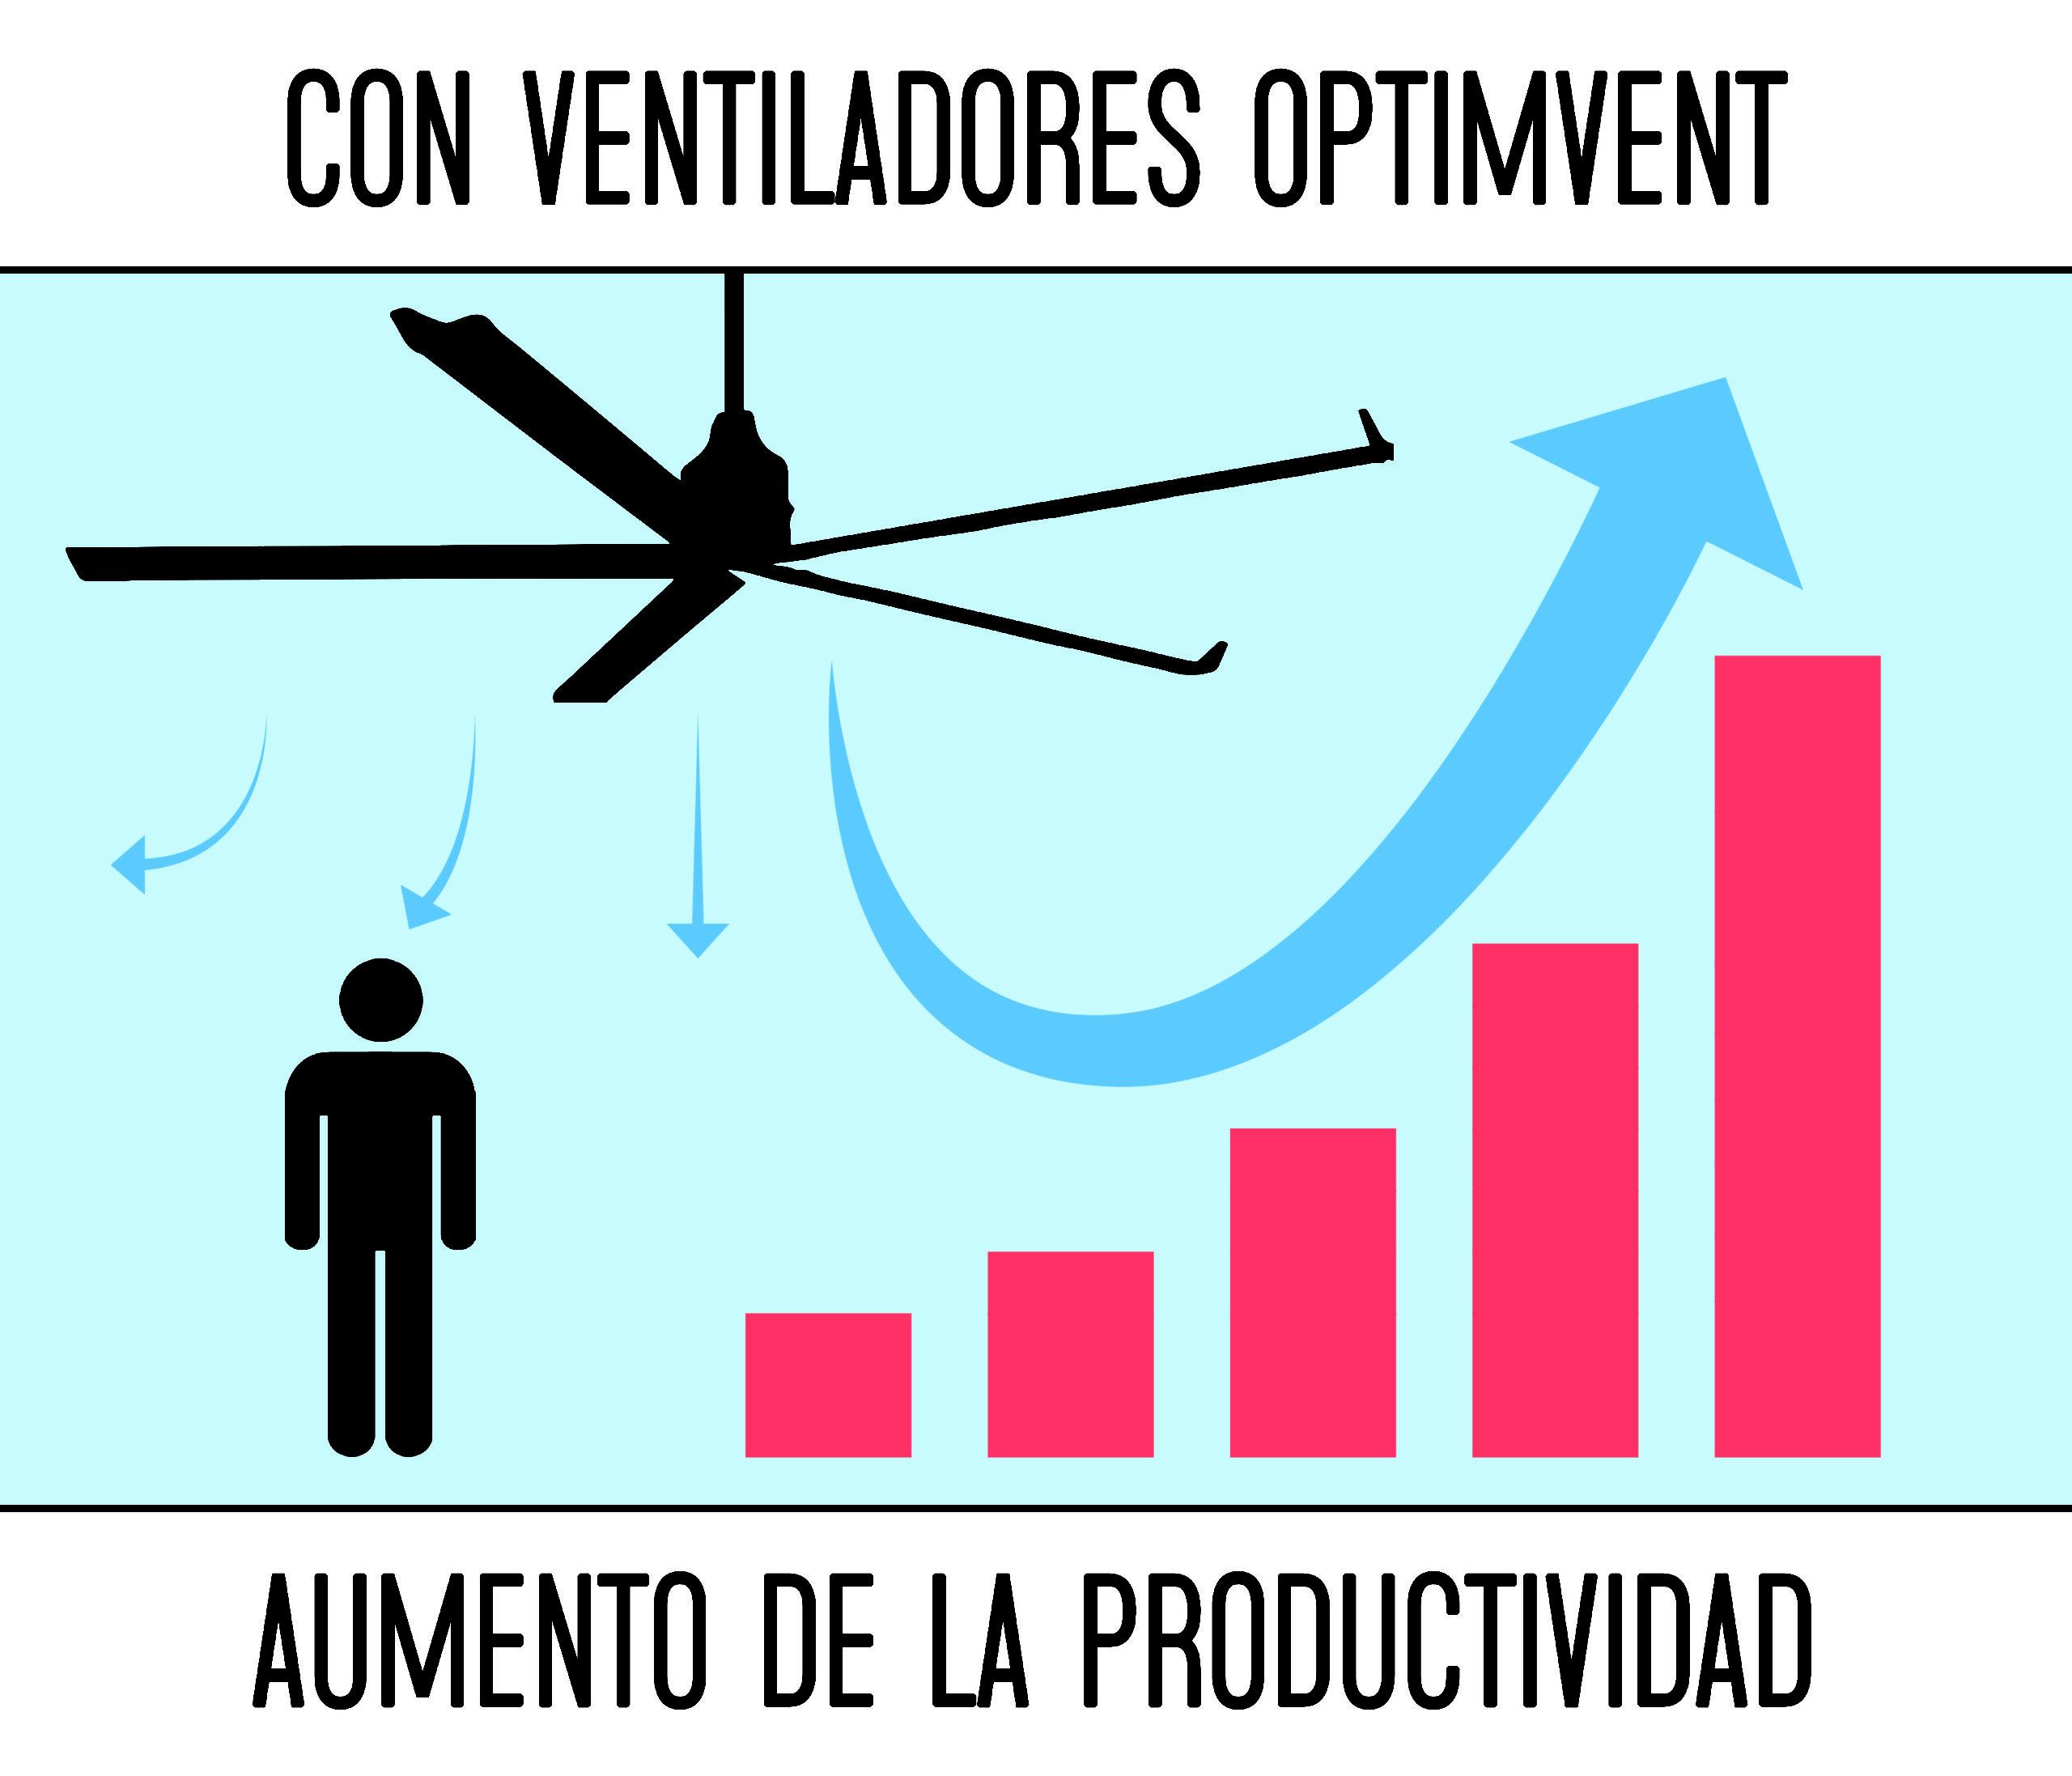 https://optimvent.com/wp-content/uploads/2020/06/infografía-8-scaled.jpg